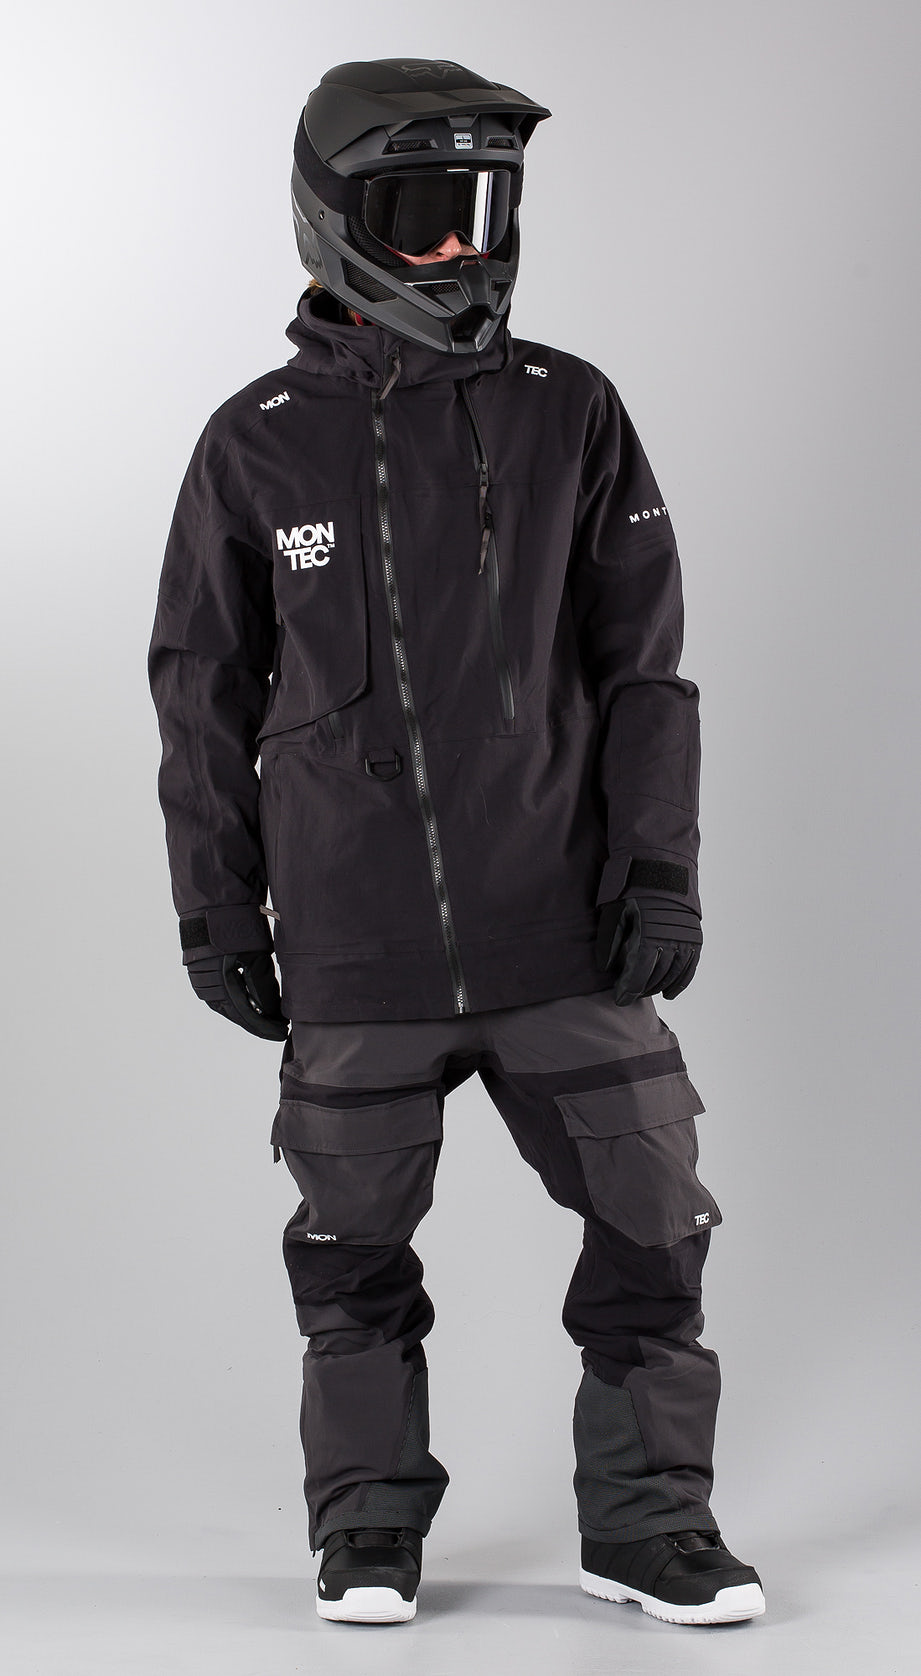 Montec Mount Black Snowmobile clothing Multi